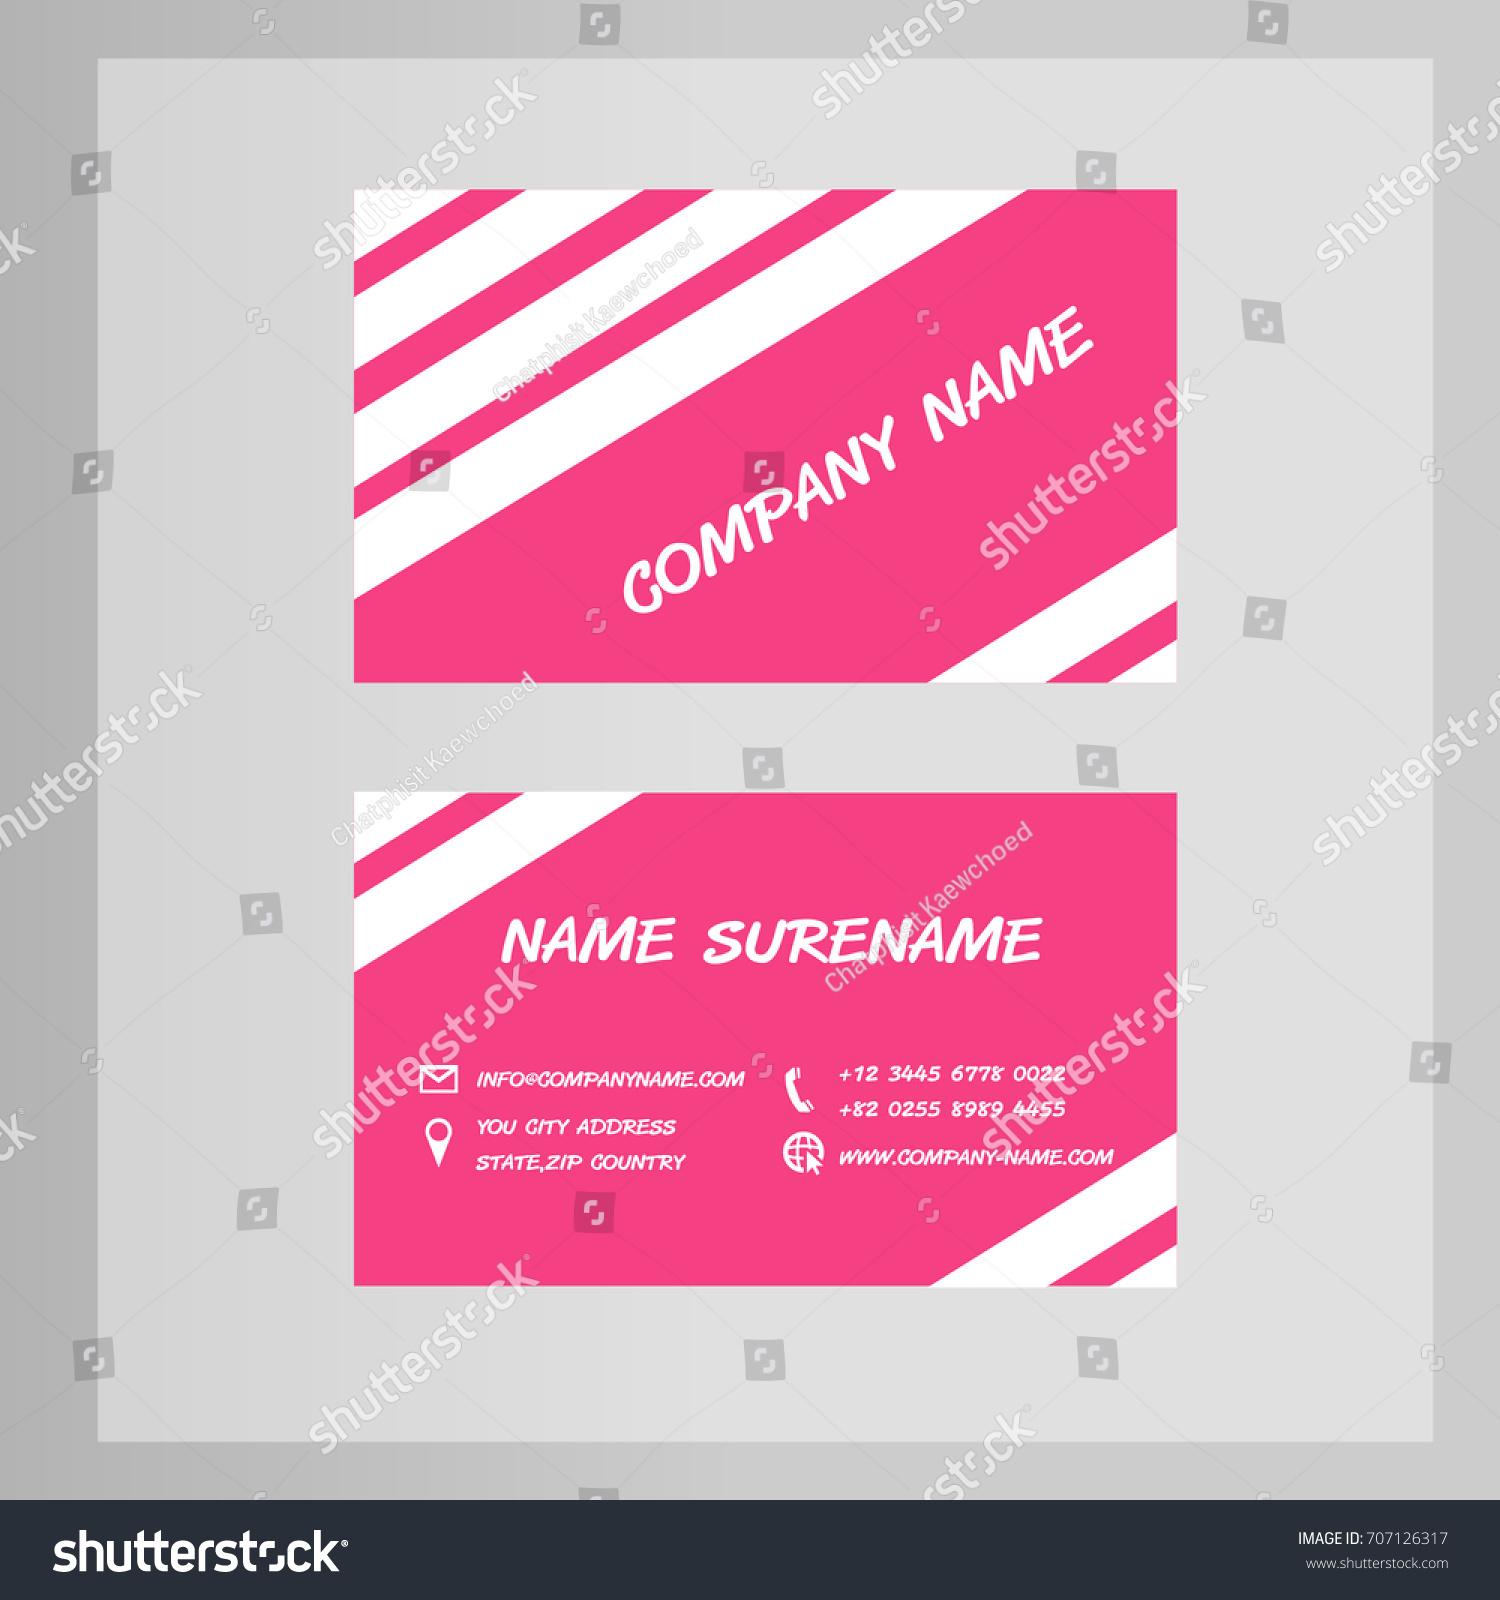 Business Card Design Black Pink Tone Stock Vector 707126317 ...